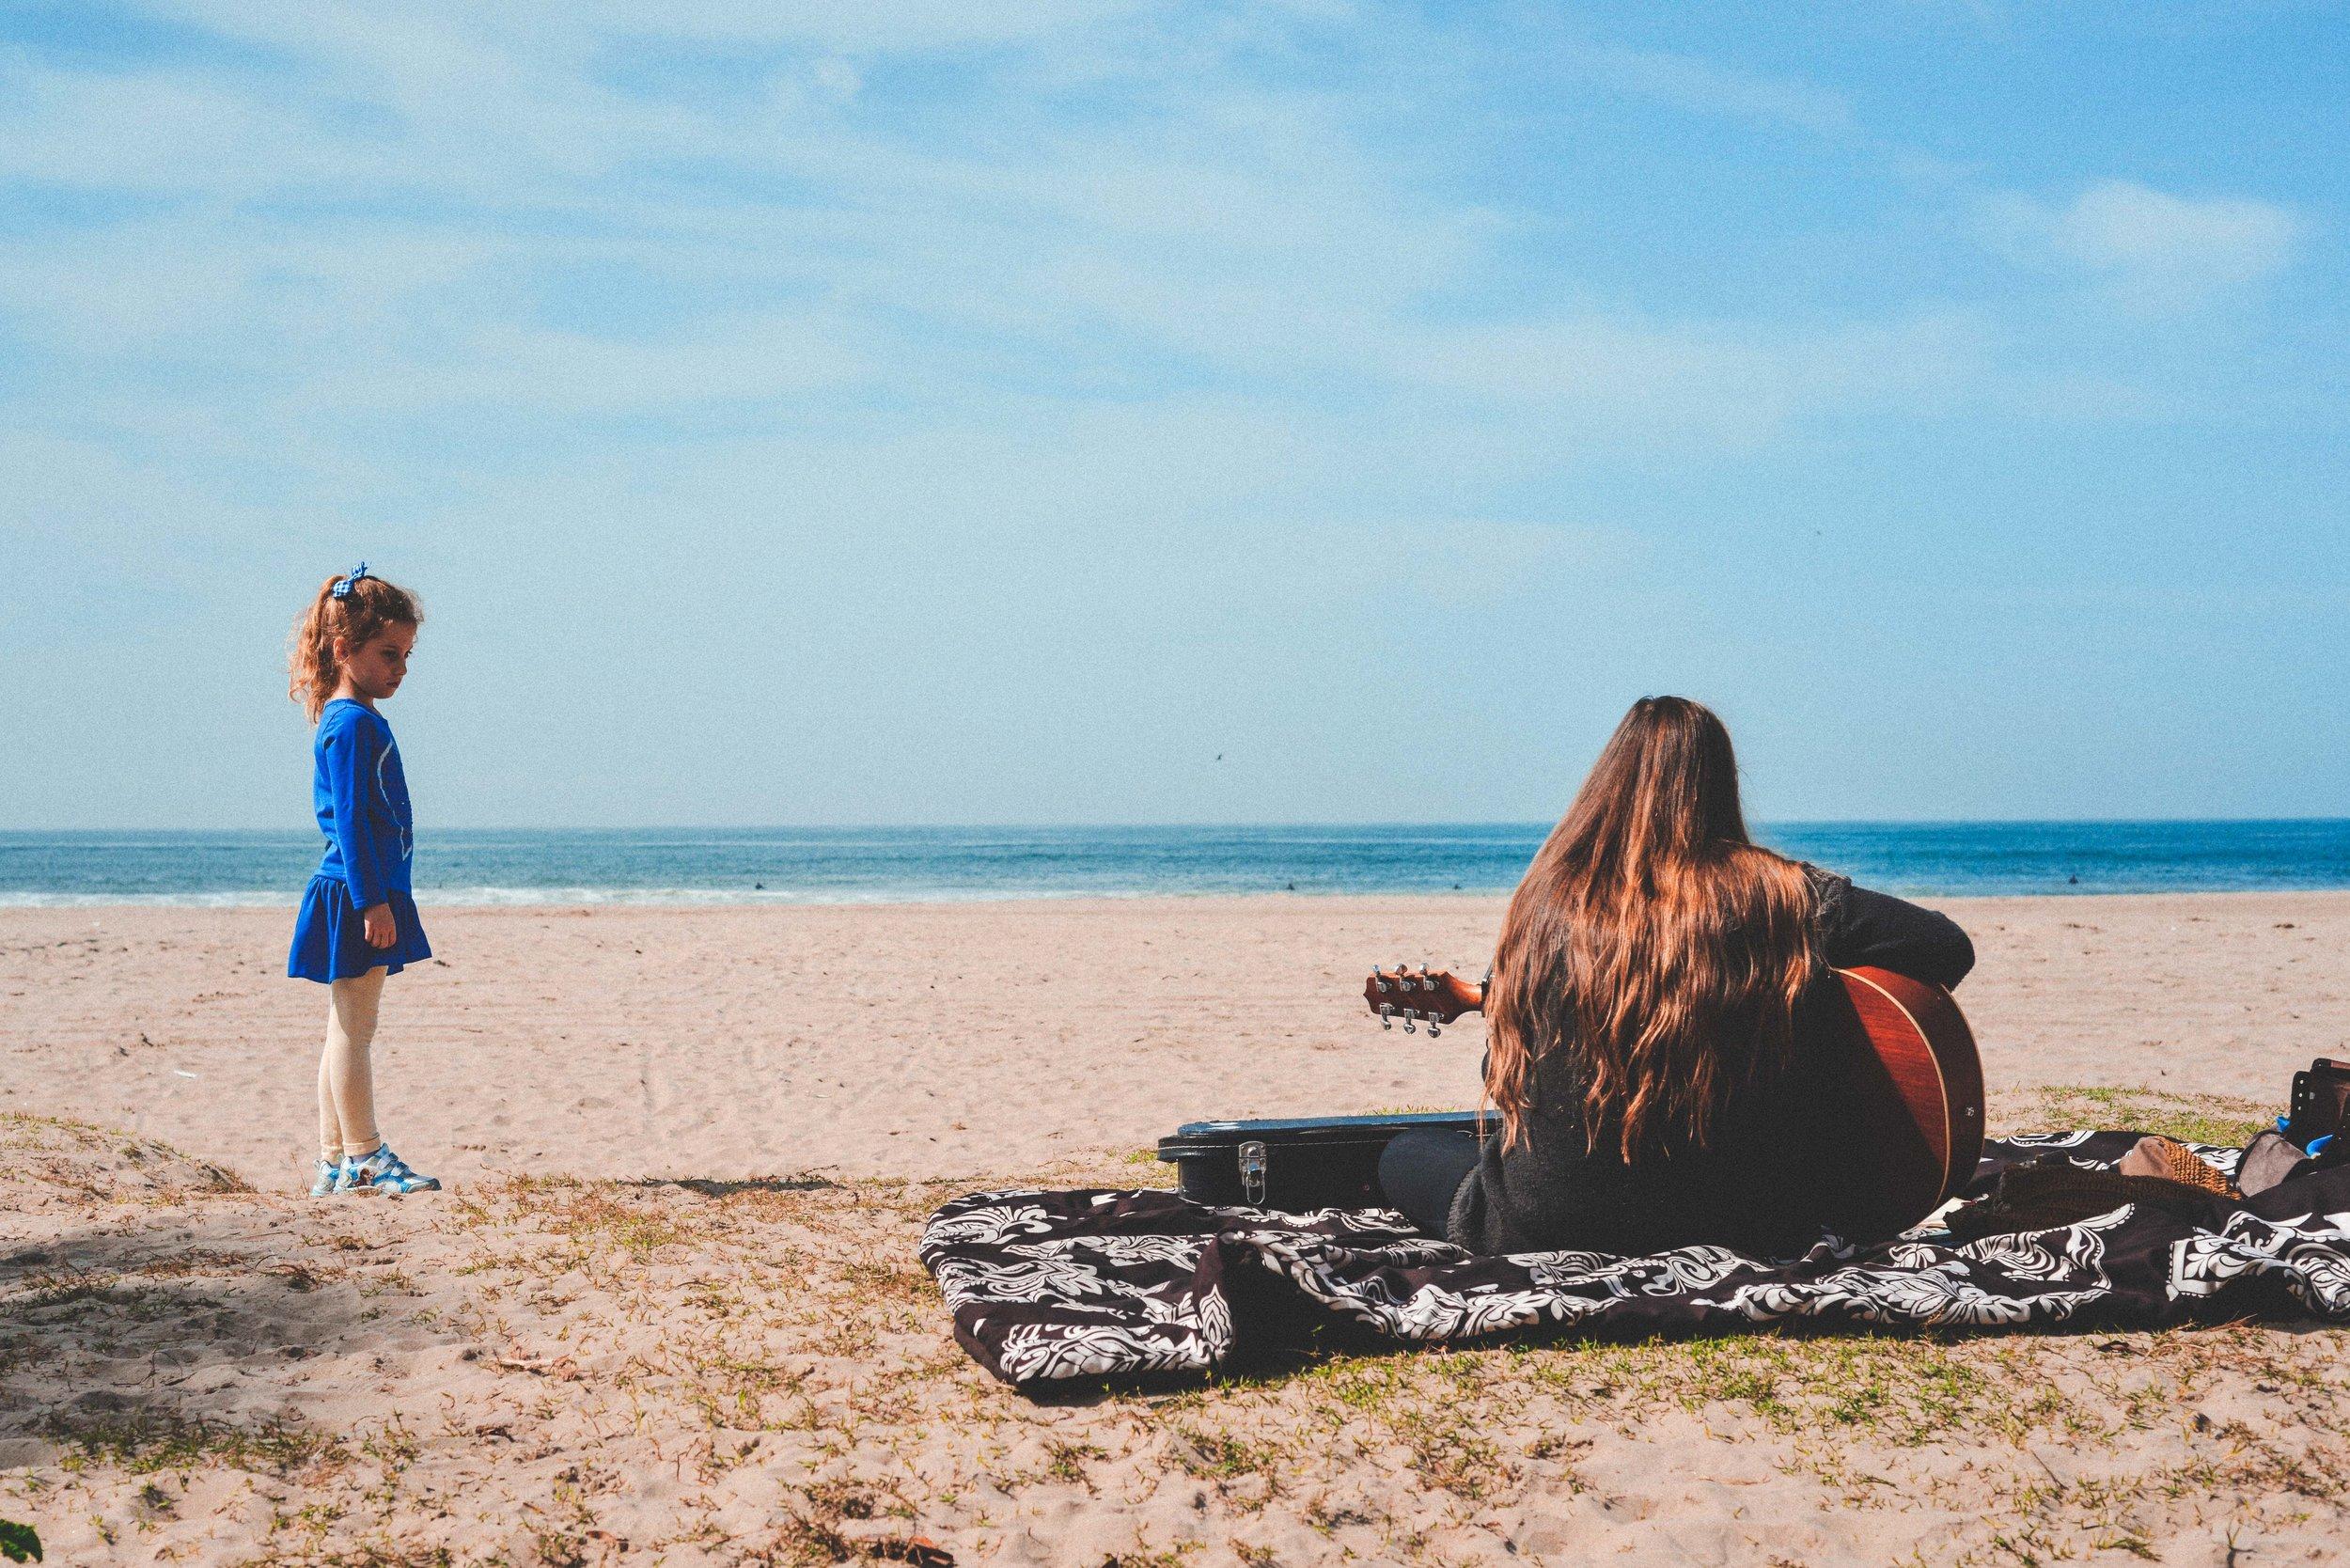 ryan thompson creative photography - girl and girl on guitar